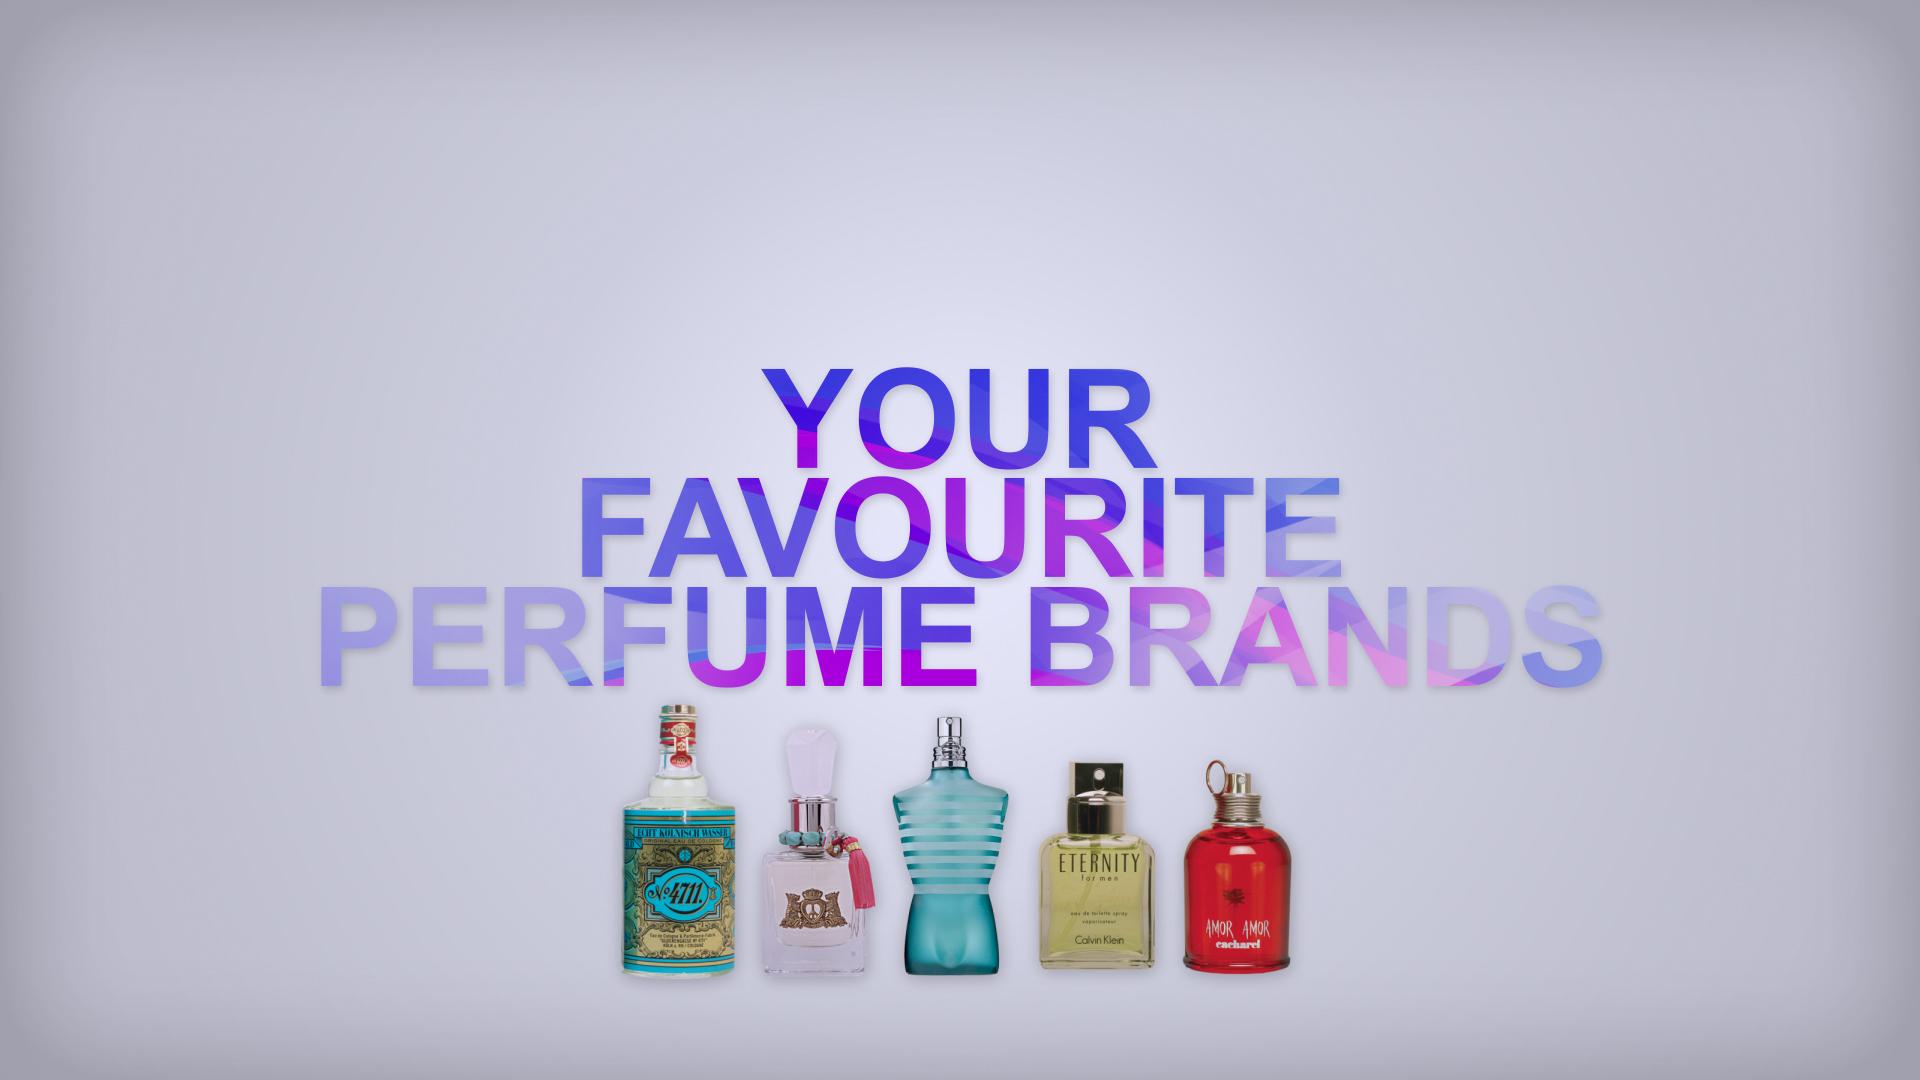 perfumedepot 30″ TV commercial